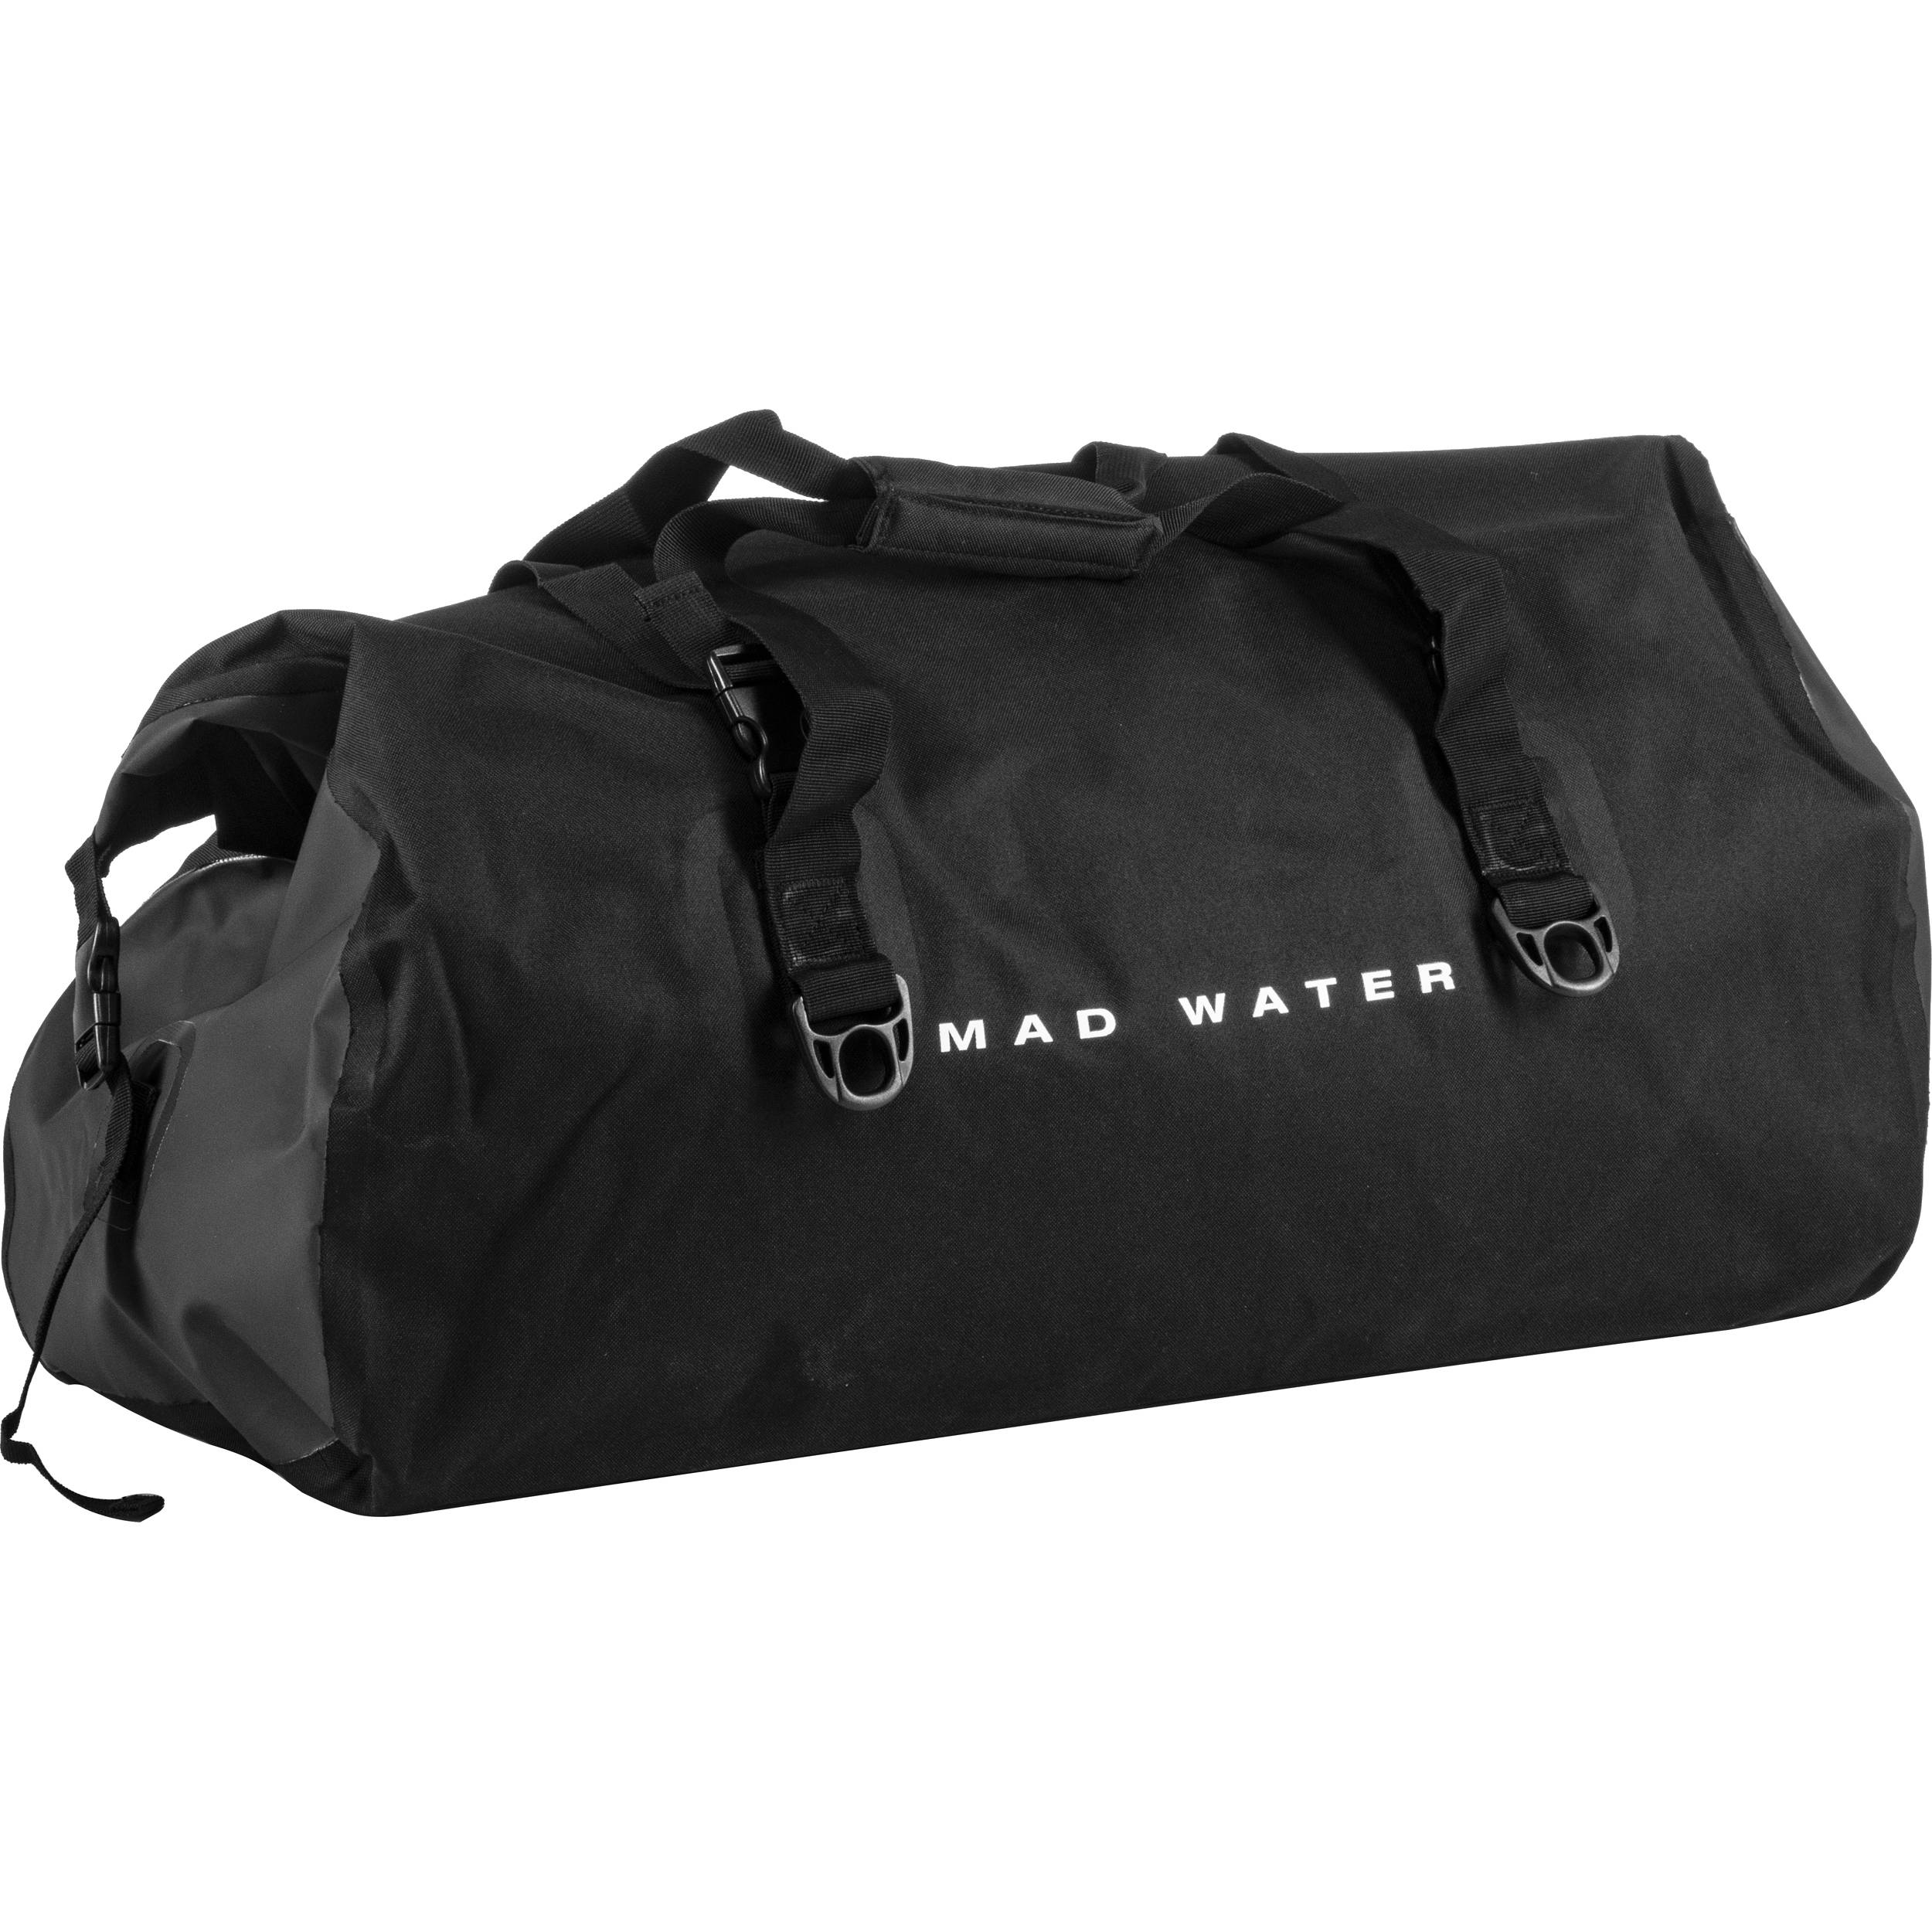 Roll Top Waterproof Duffel Bag M46000 B H